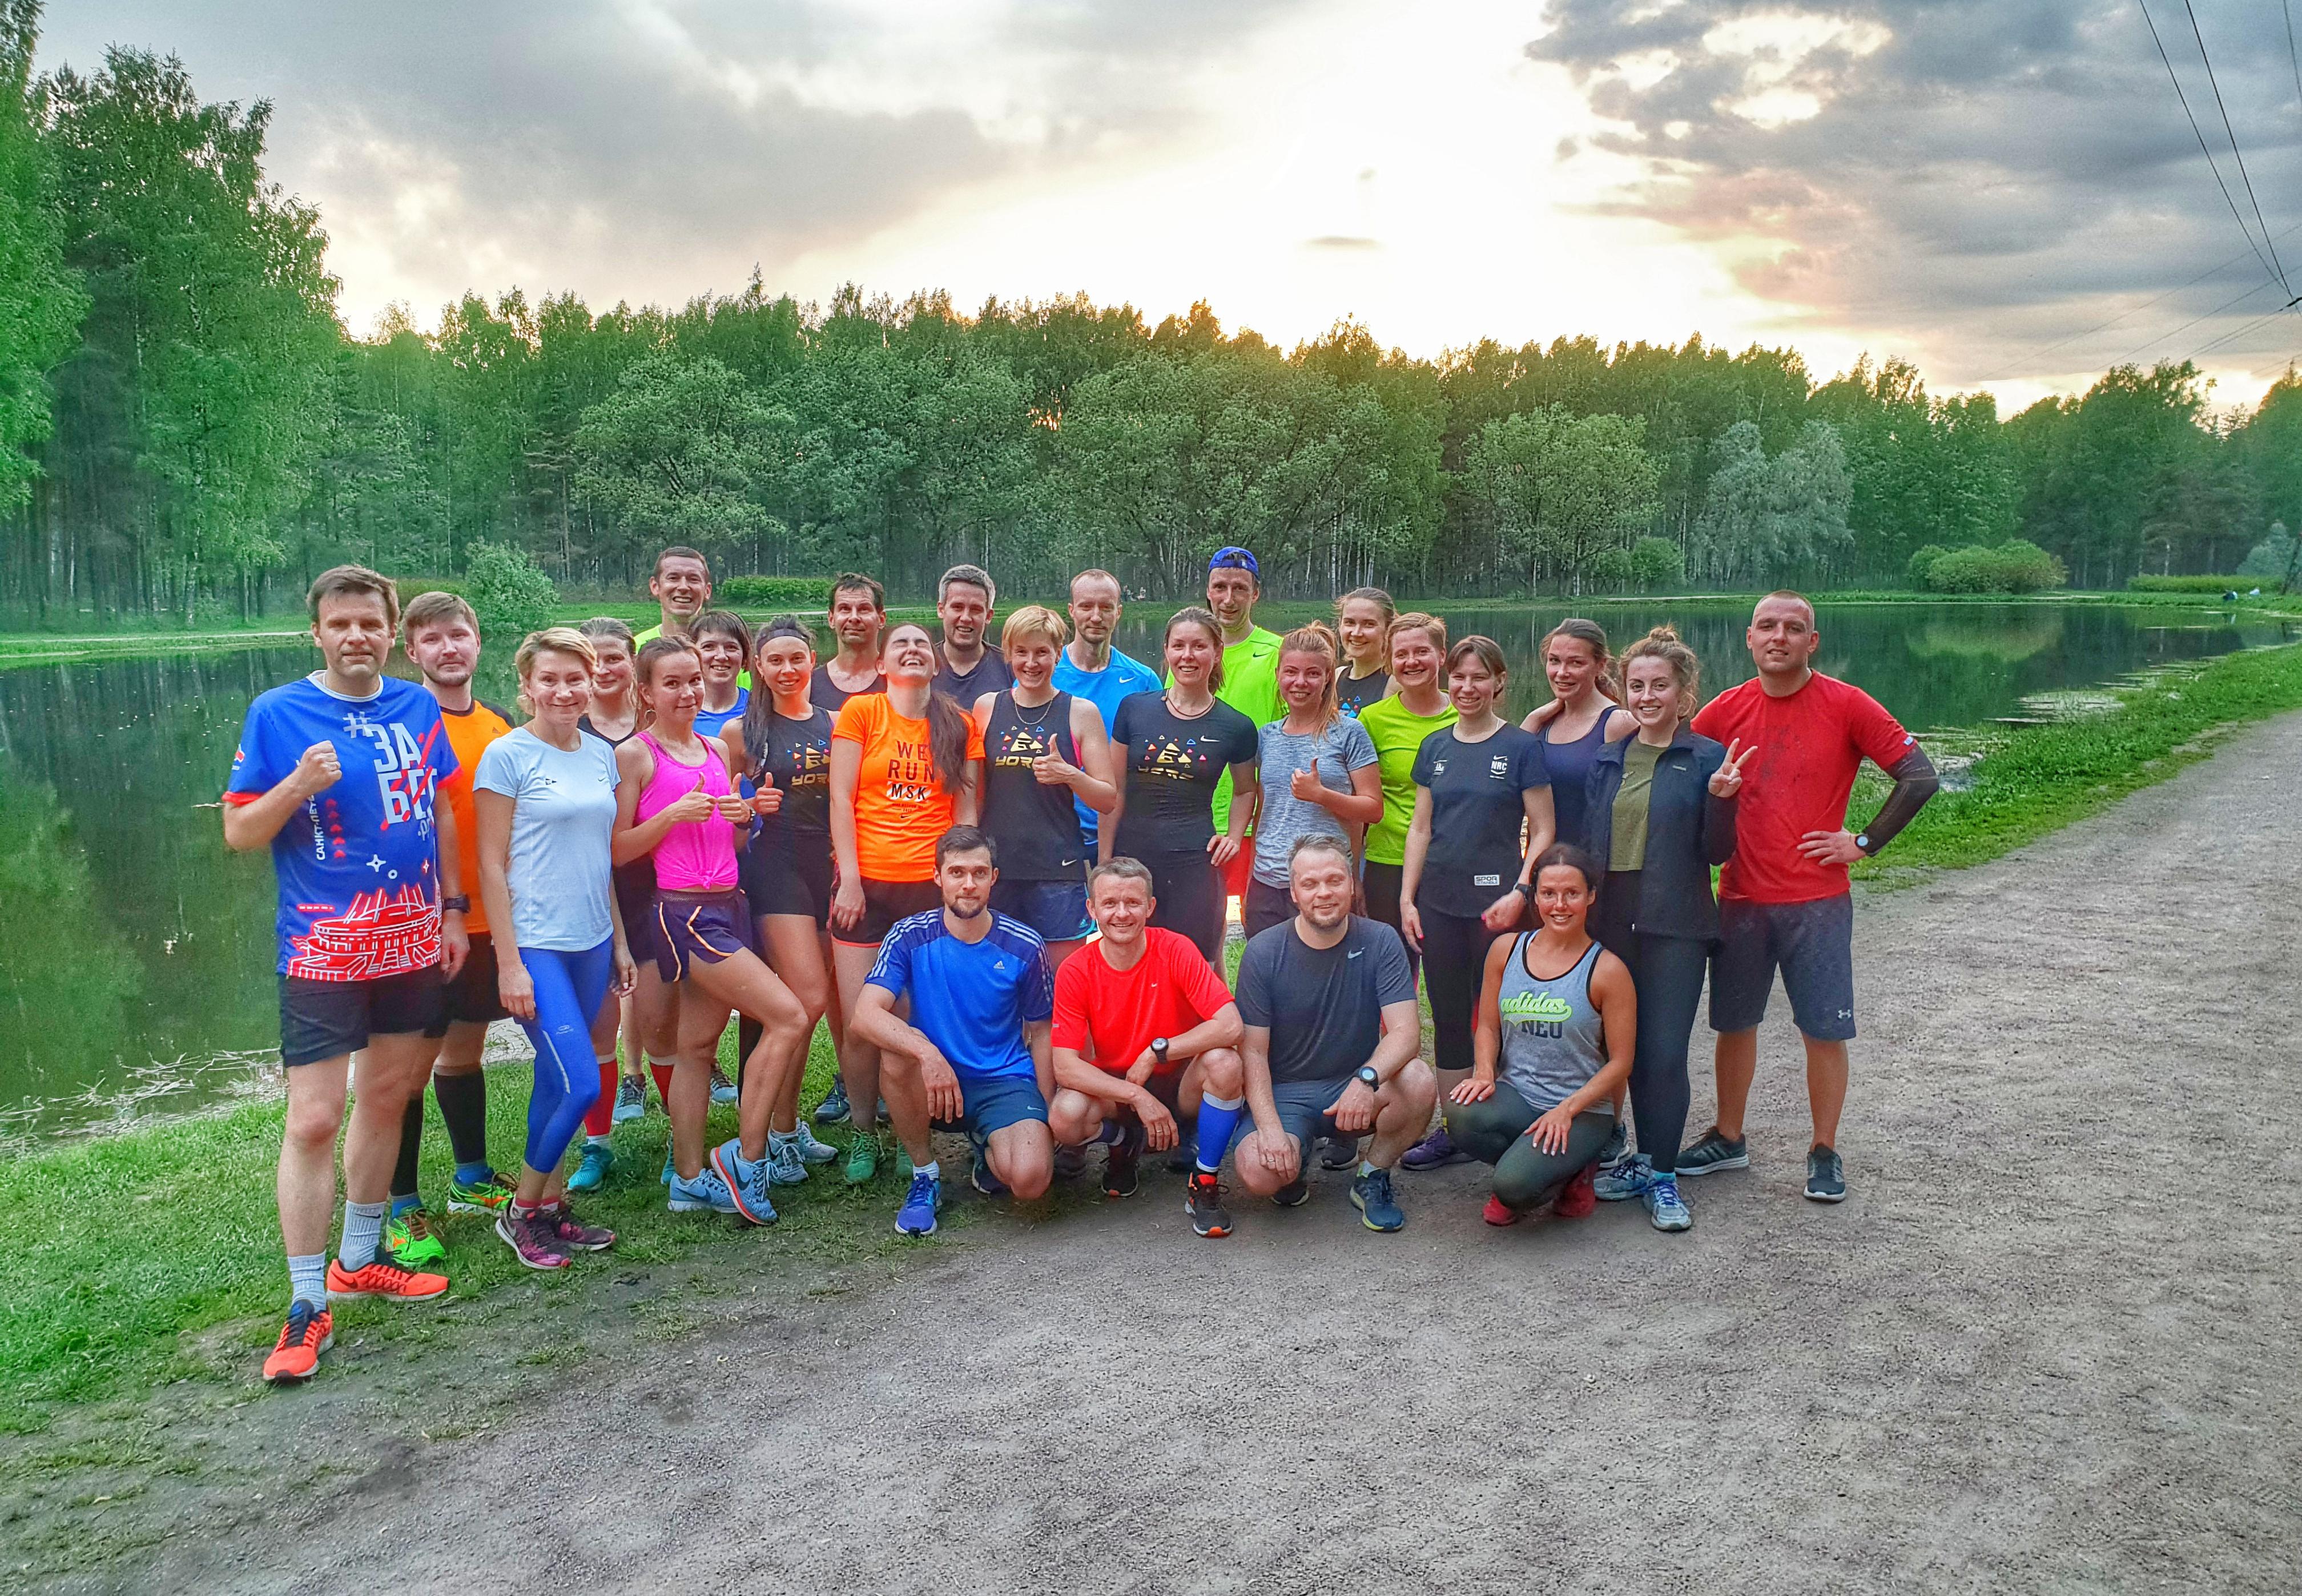 Беговой клуб YORC runners, Санкт-Петербург